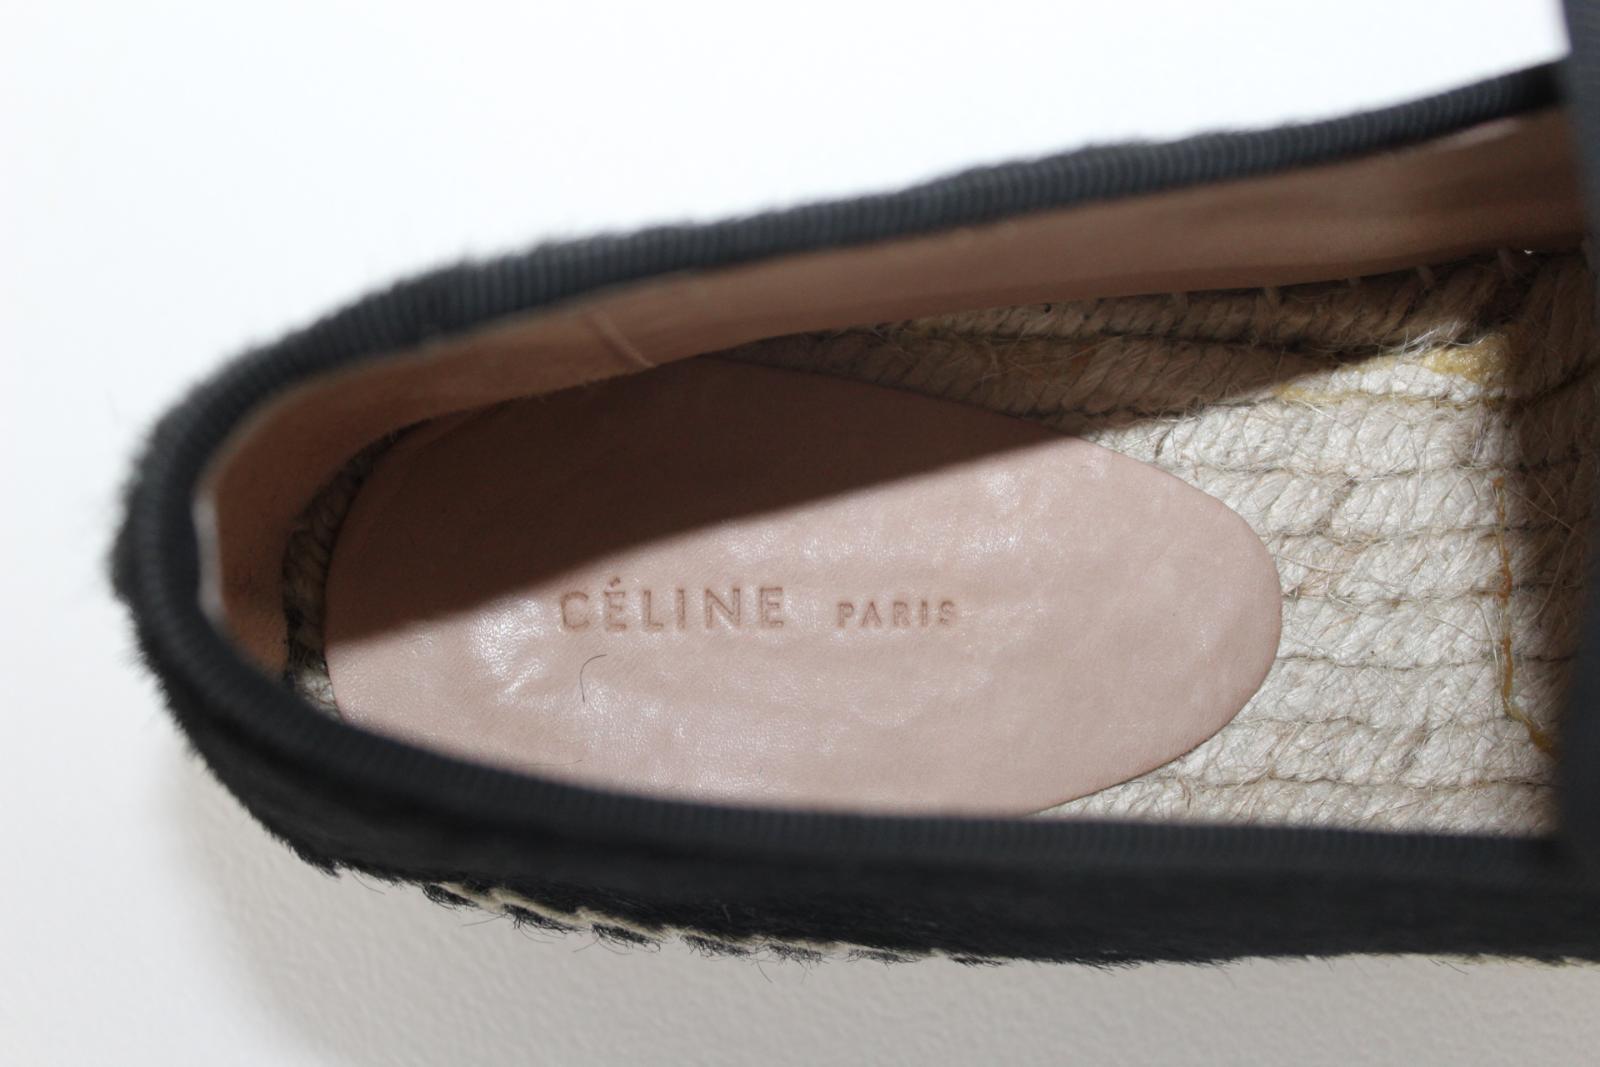 CELINE-Stacy-Black-Pony-Hair-Ladies-Flat-Espadrilles-Shoes-UK3-EU36-5-BNIB thumbnail 8